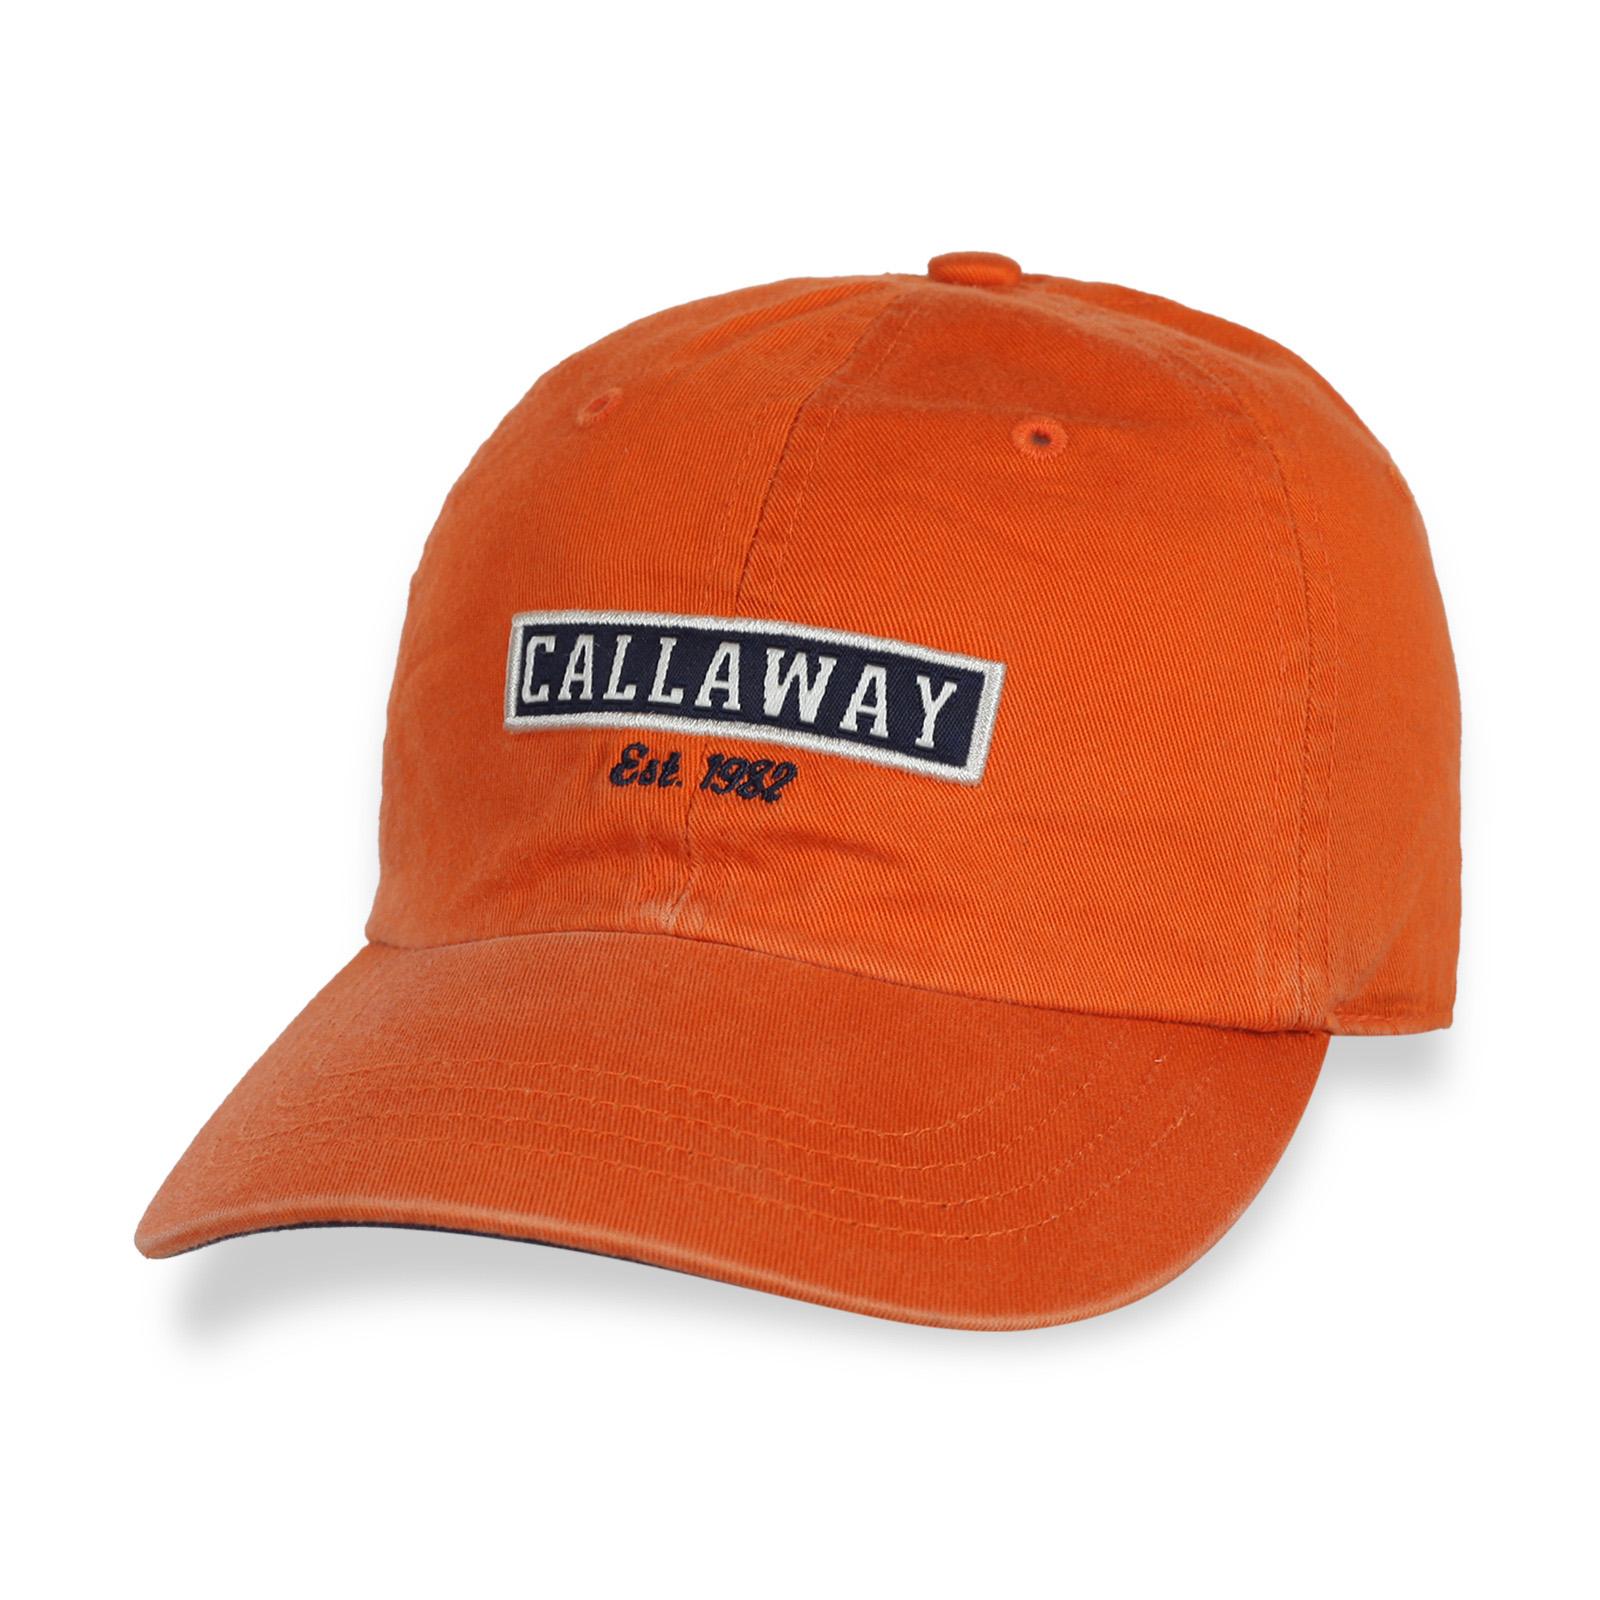 Фирменная кепка Gallaway.